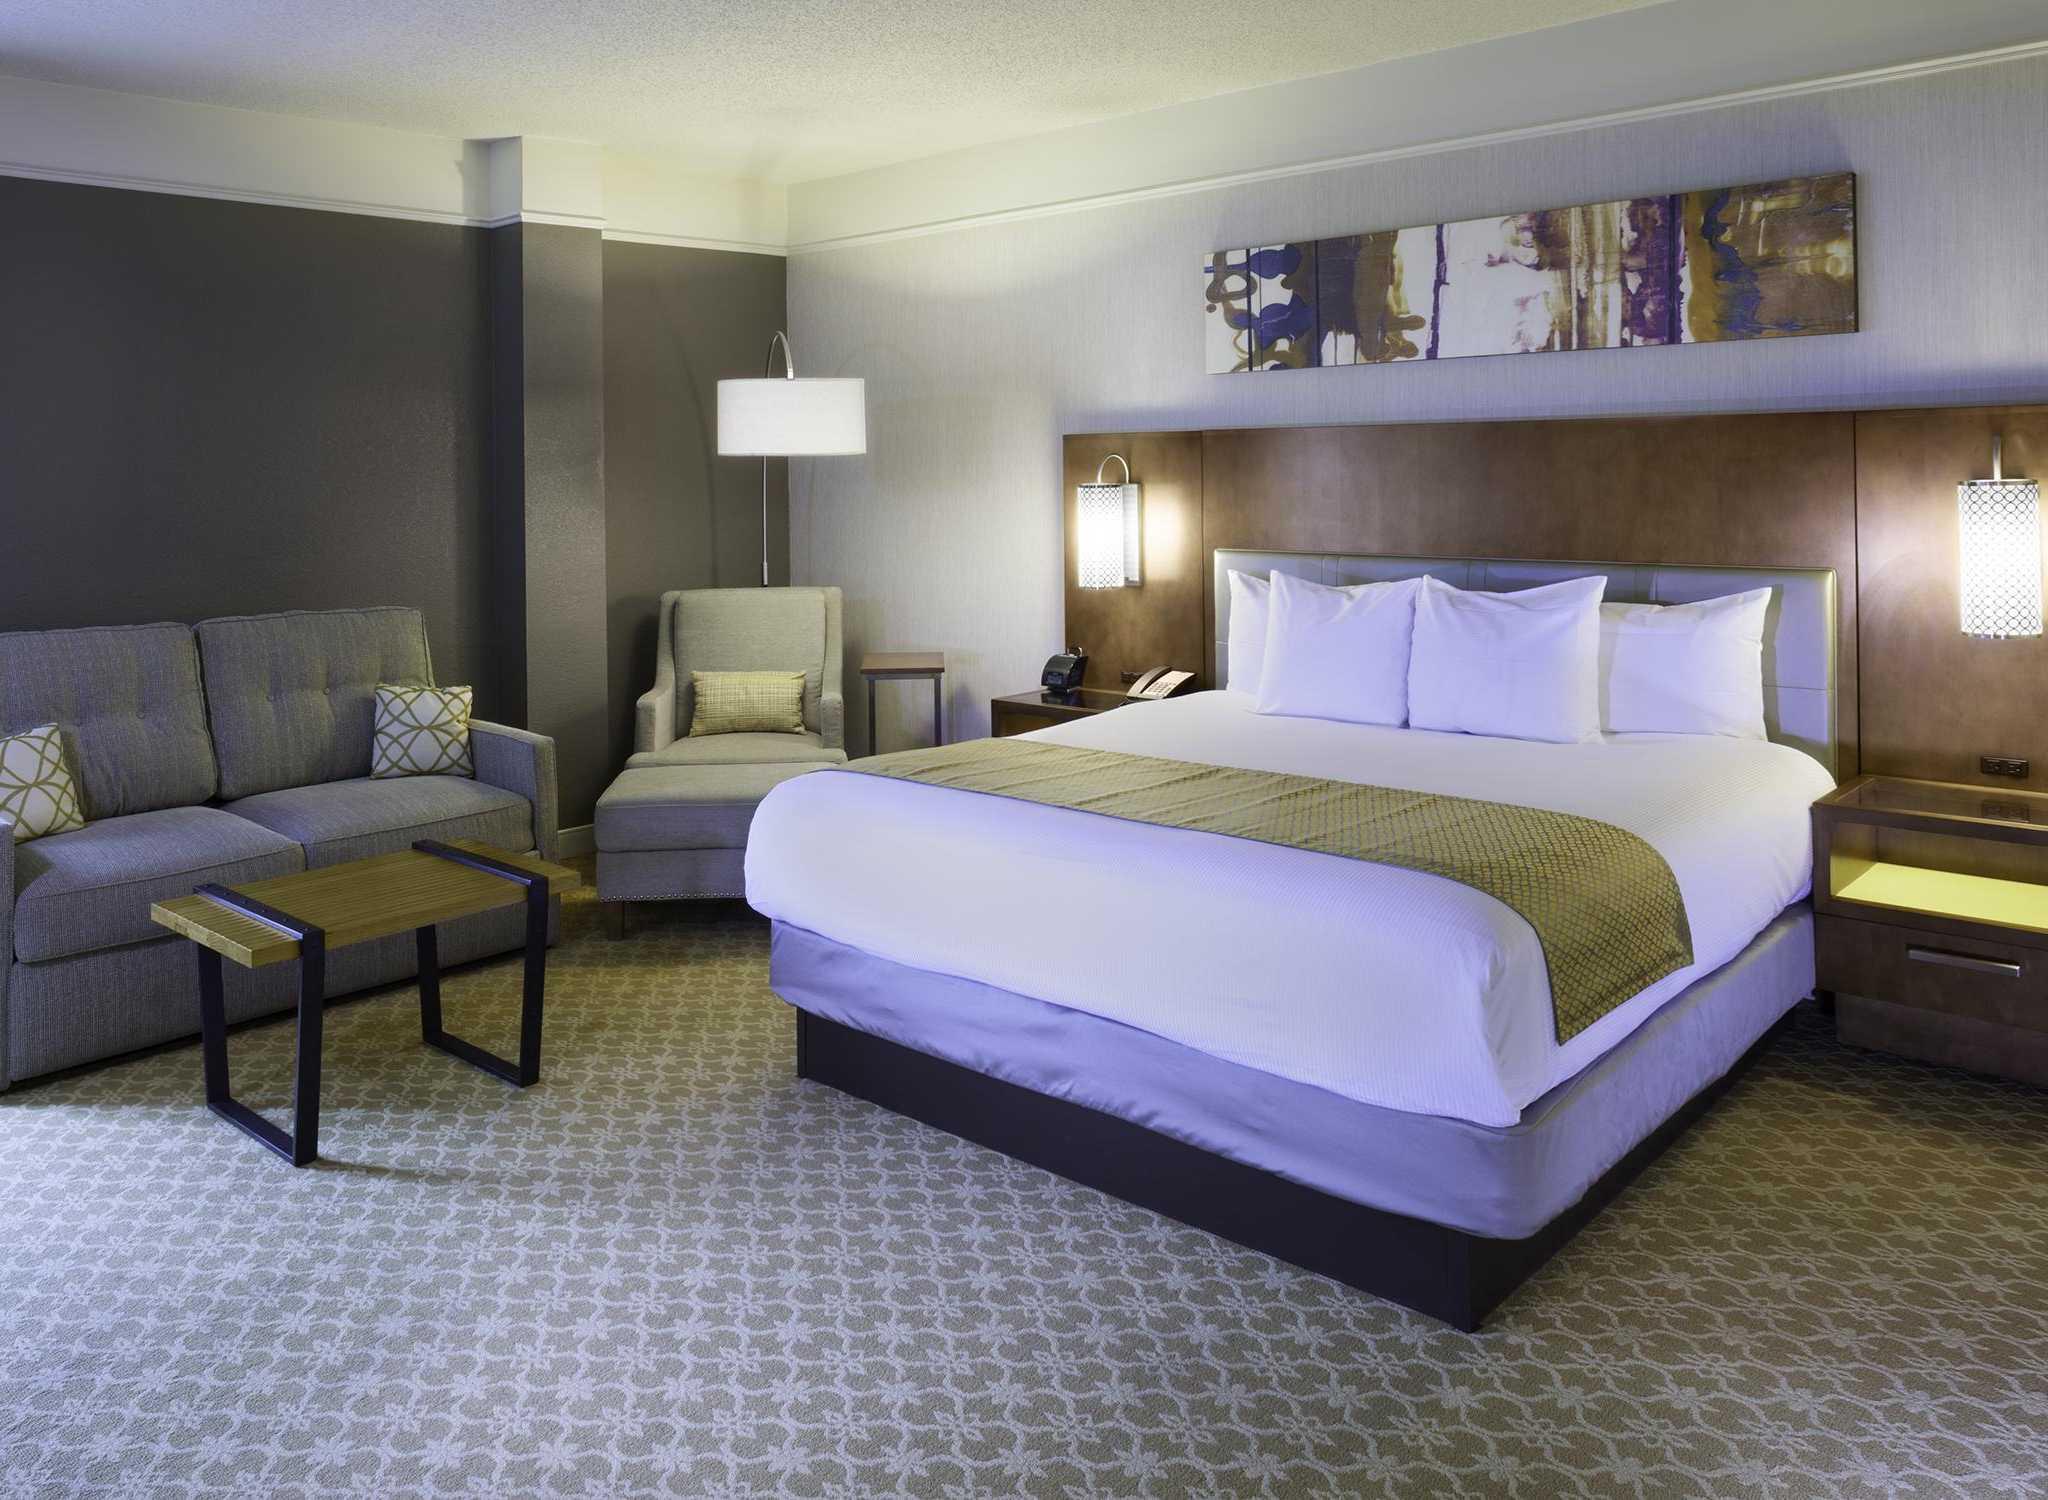 hotels in atlanta buckhead doubletree buckhead. Black Bedroom Furniture Sets. Home Design Ideas